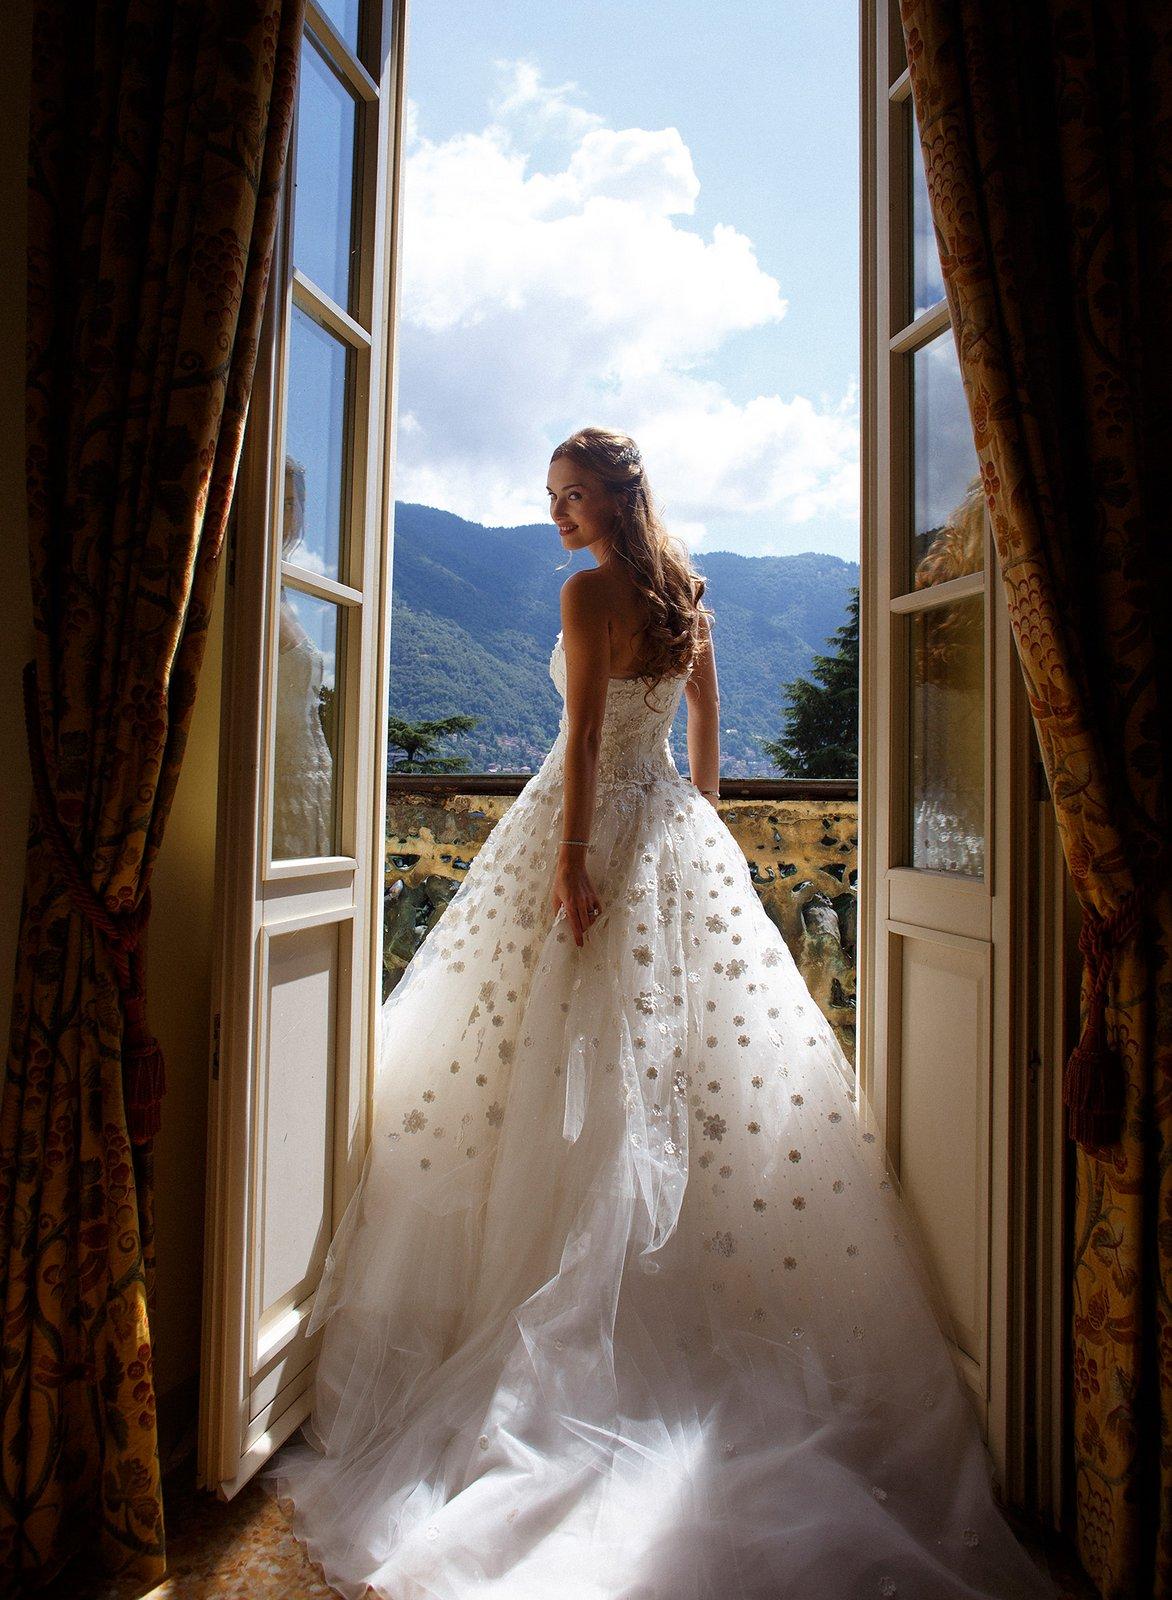 06-daria-and-max-wedding-lake-como